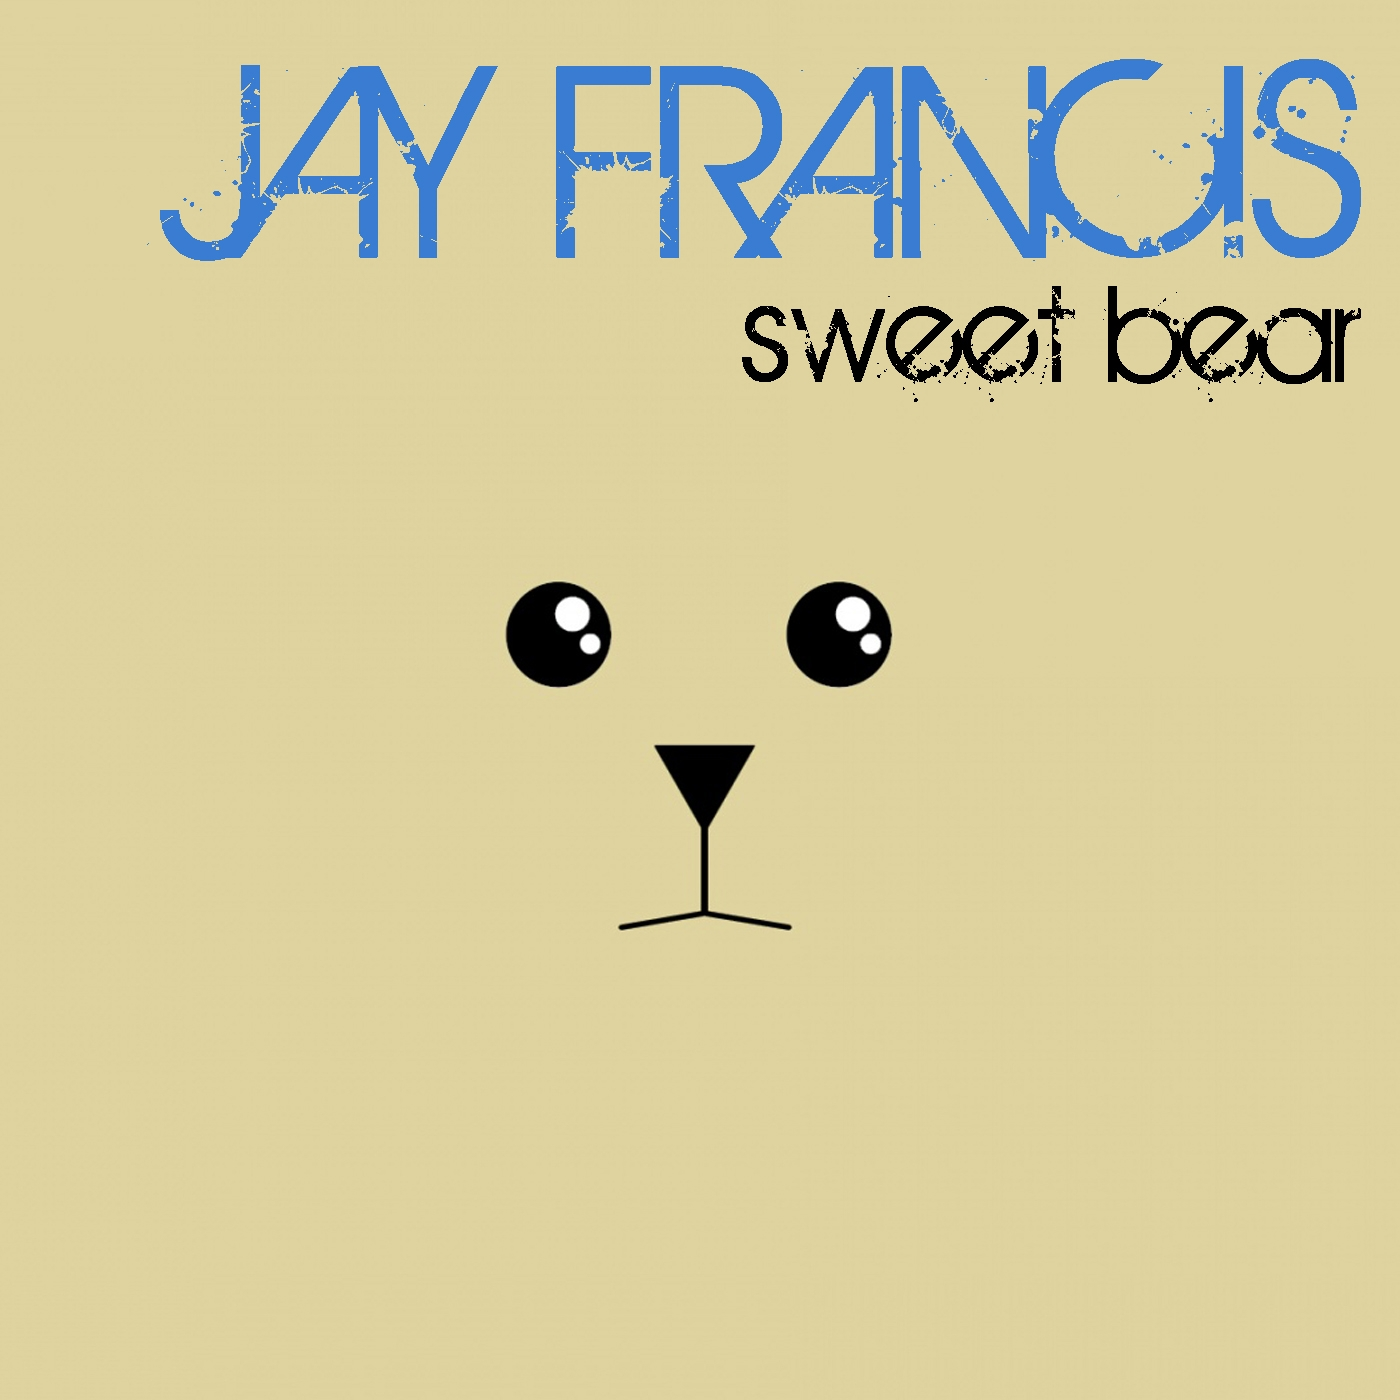 Jay Francis - Kingdom (Original Mix)